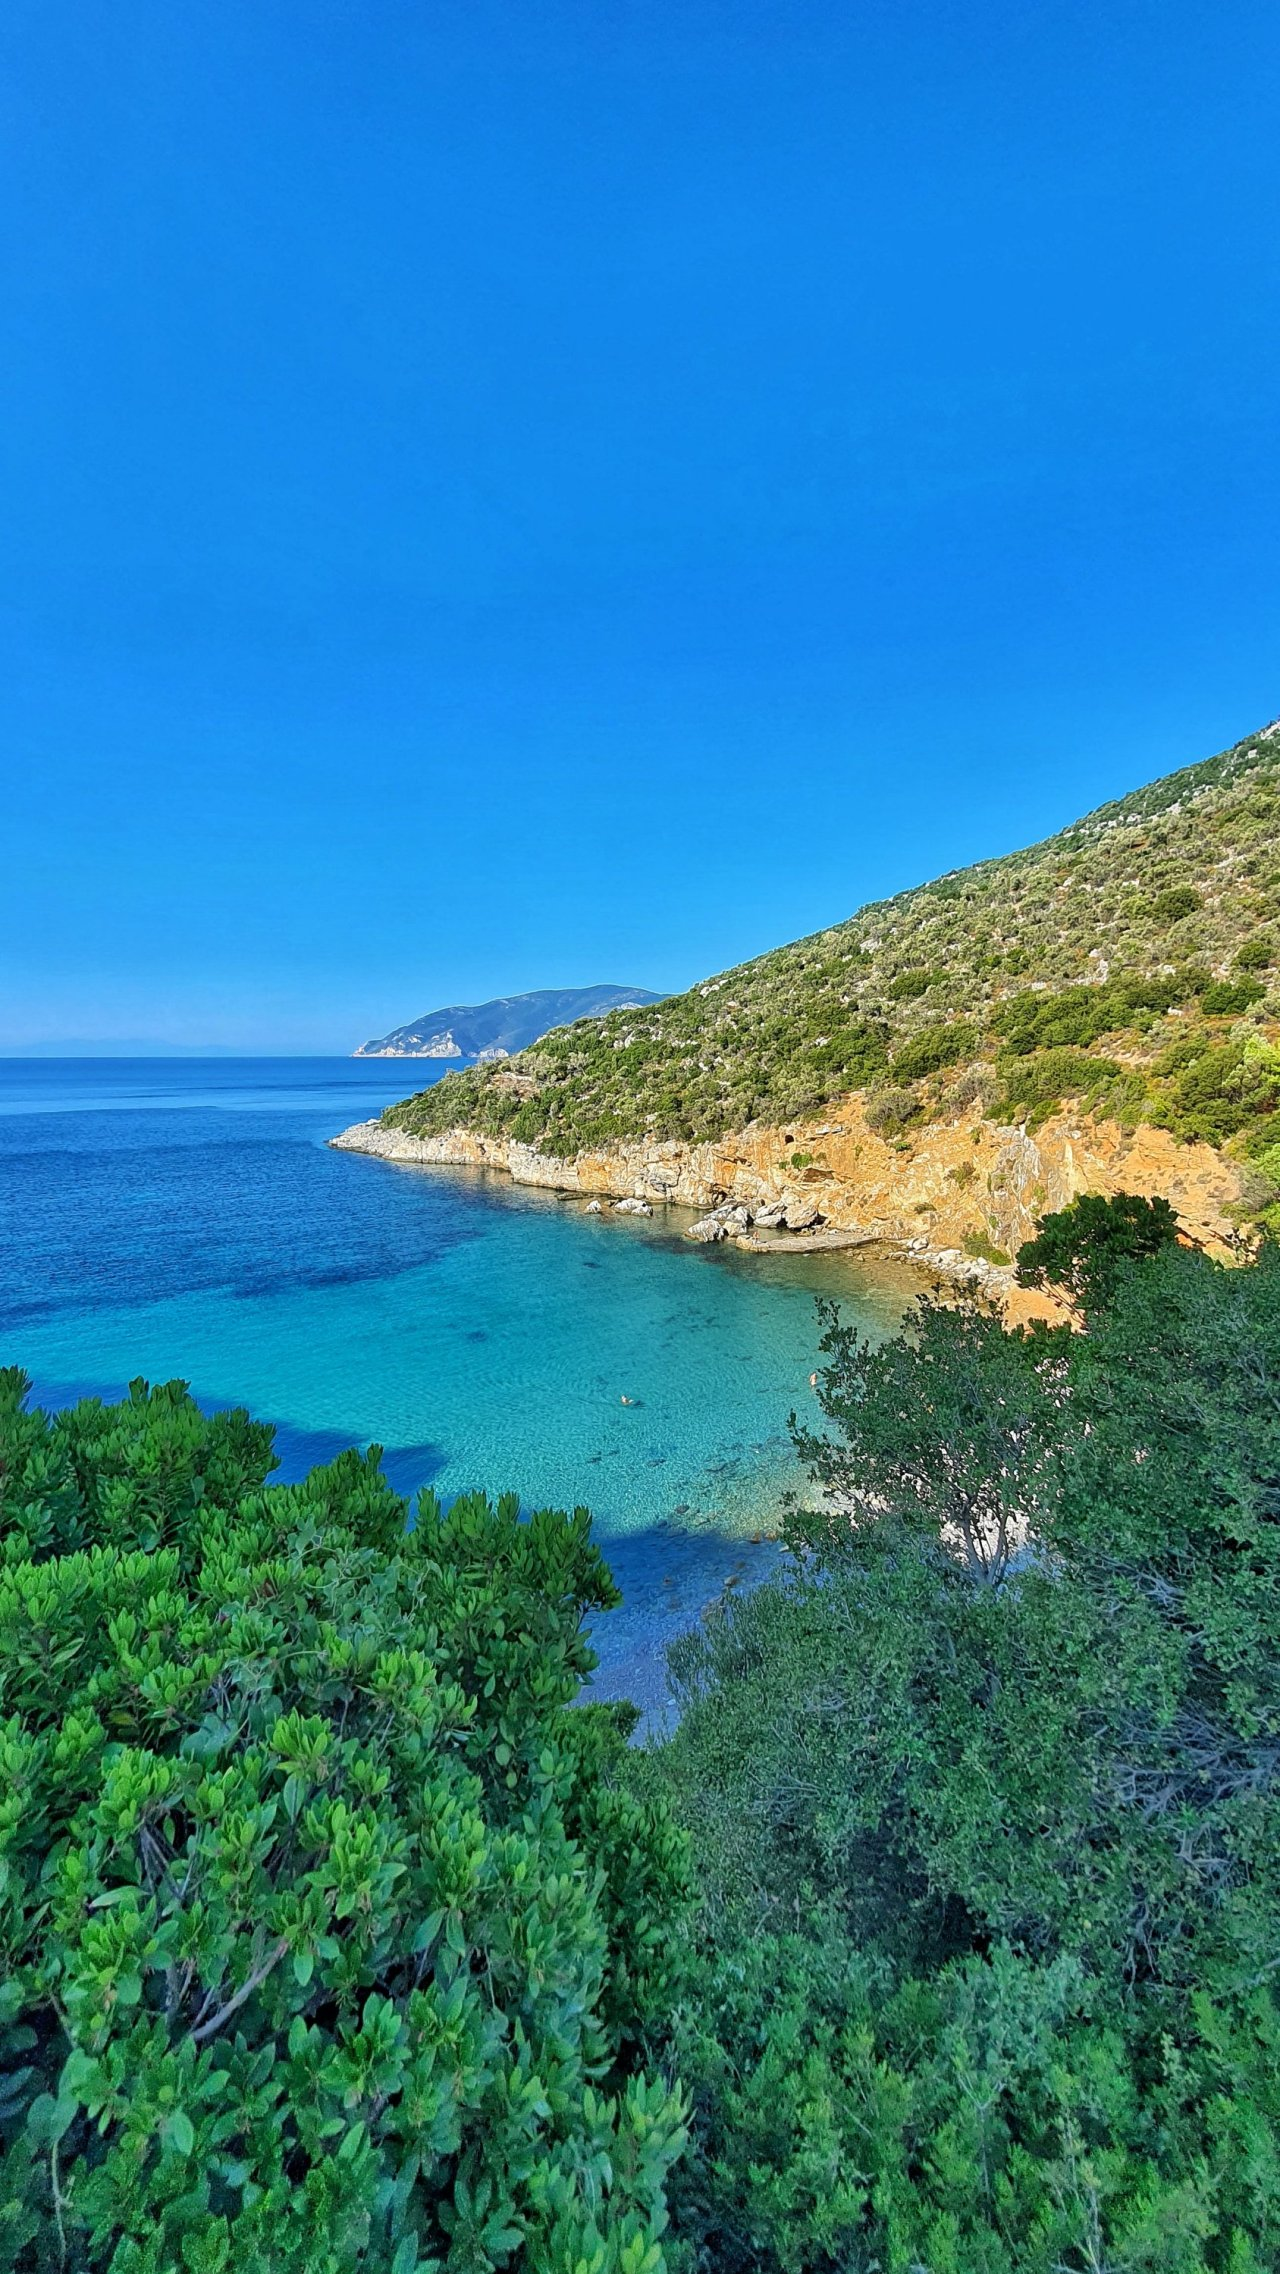 Mikros Mourtias beach, Alonissos🇬🇷